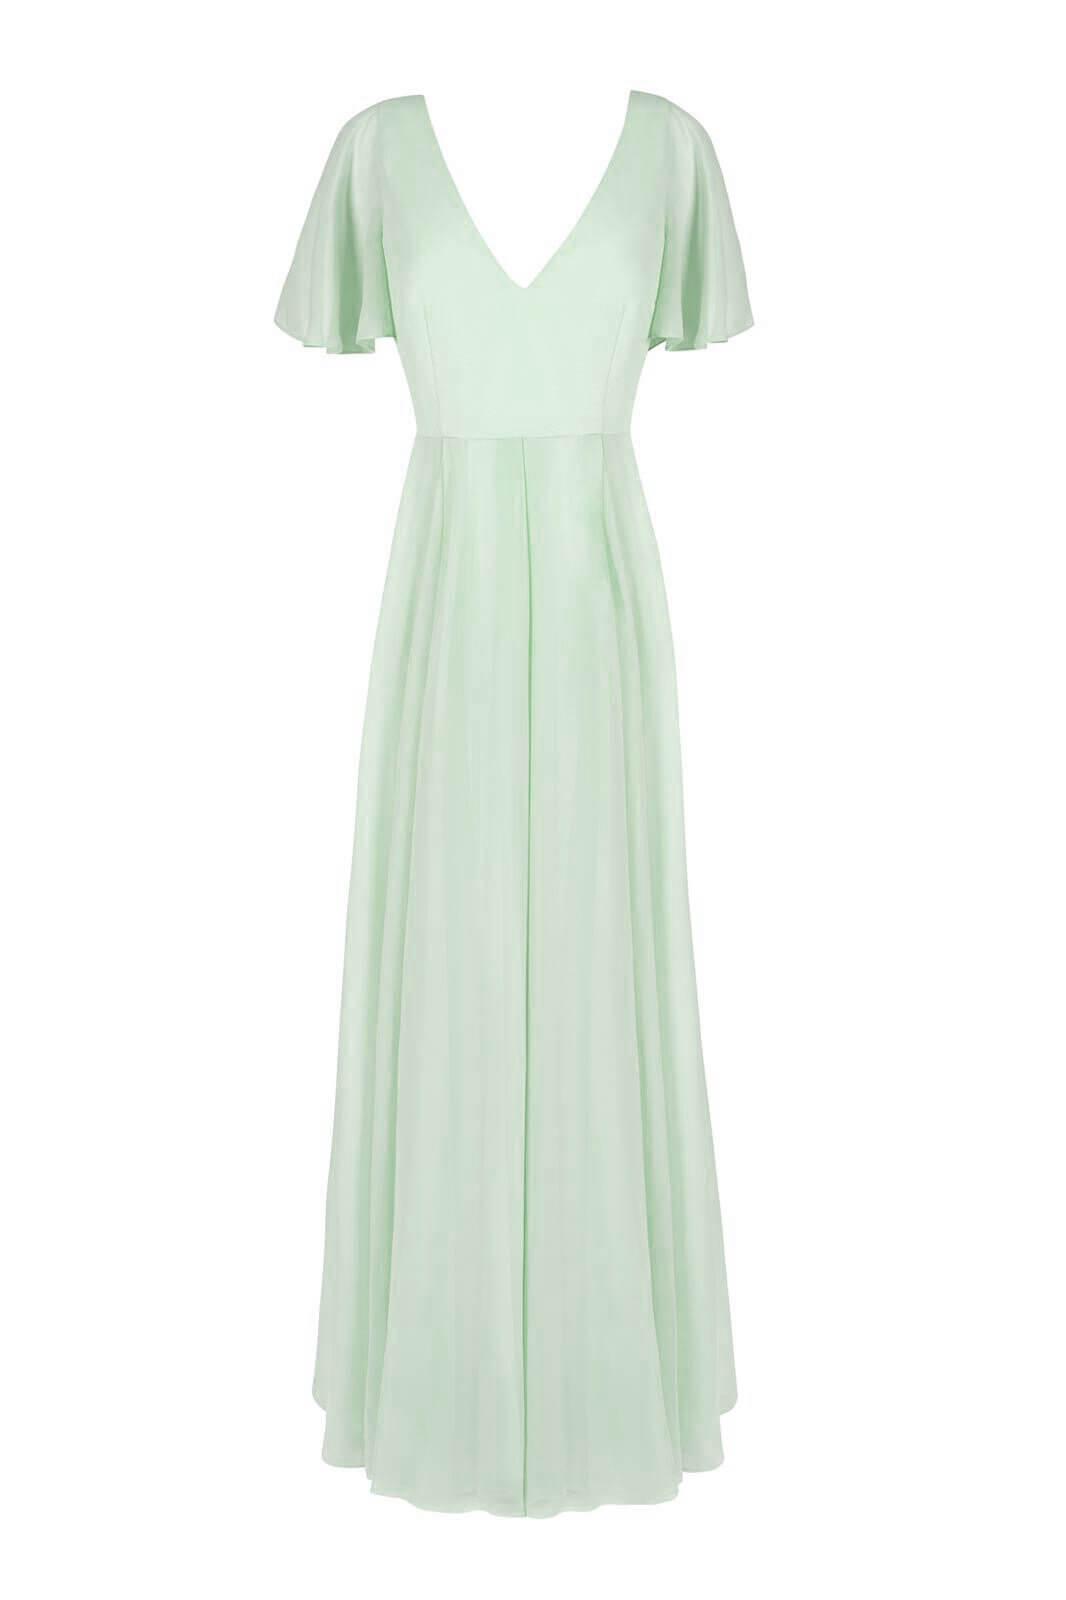 TH&H Bridesmaid Dress Mint